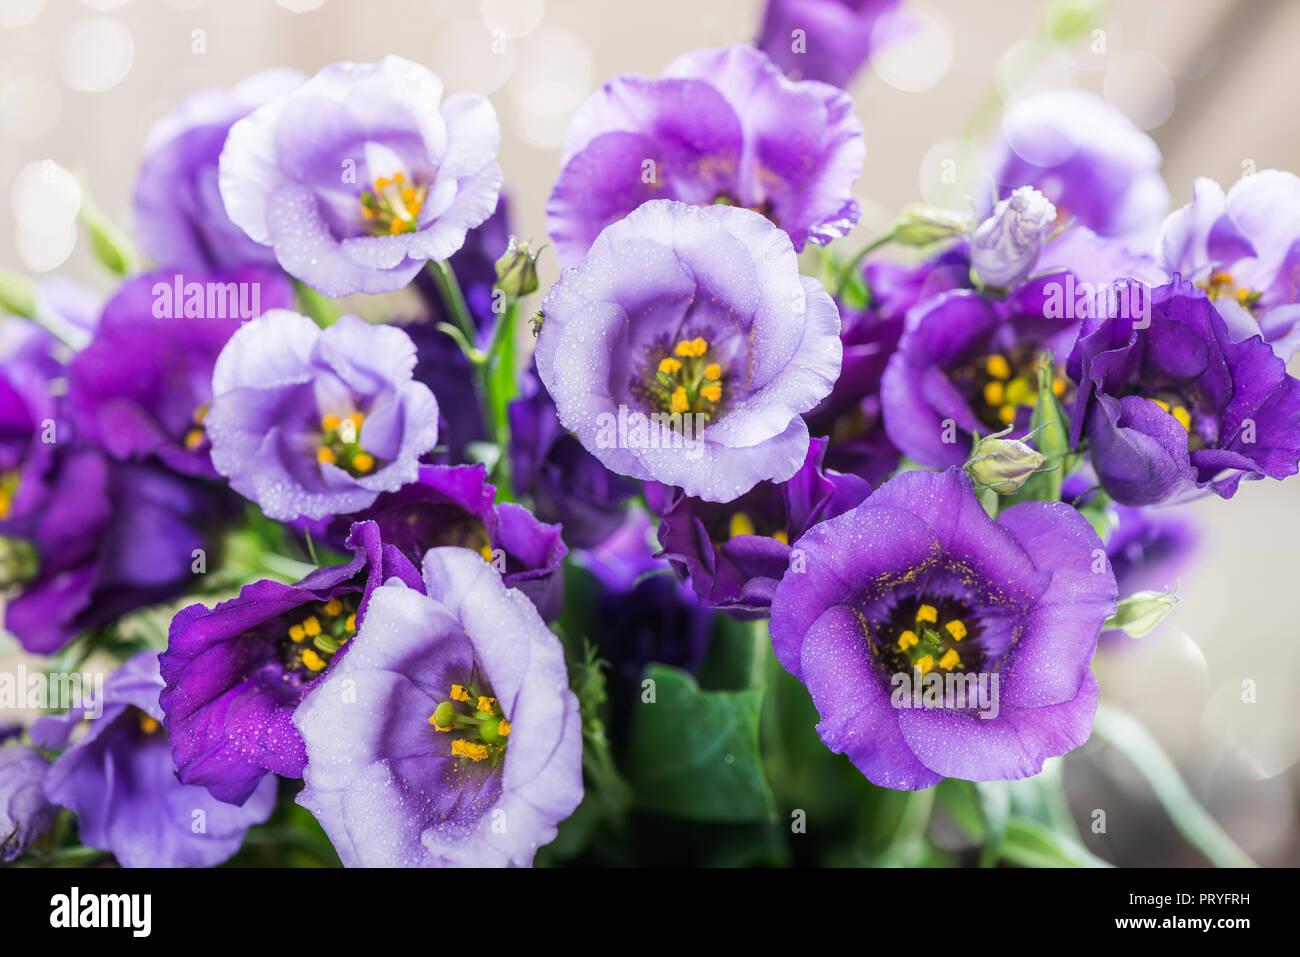 Beautiful Bouquet of Purple Eustoma flowers, Lisianthus, light background - Stock Image